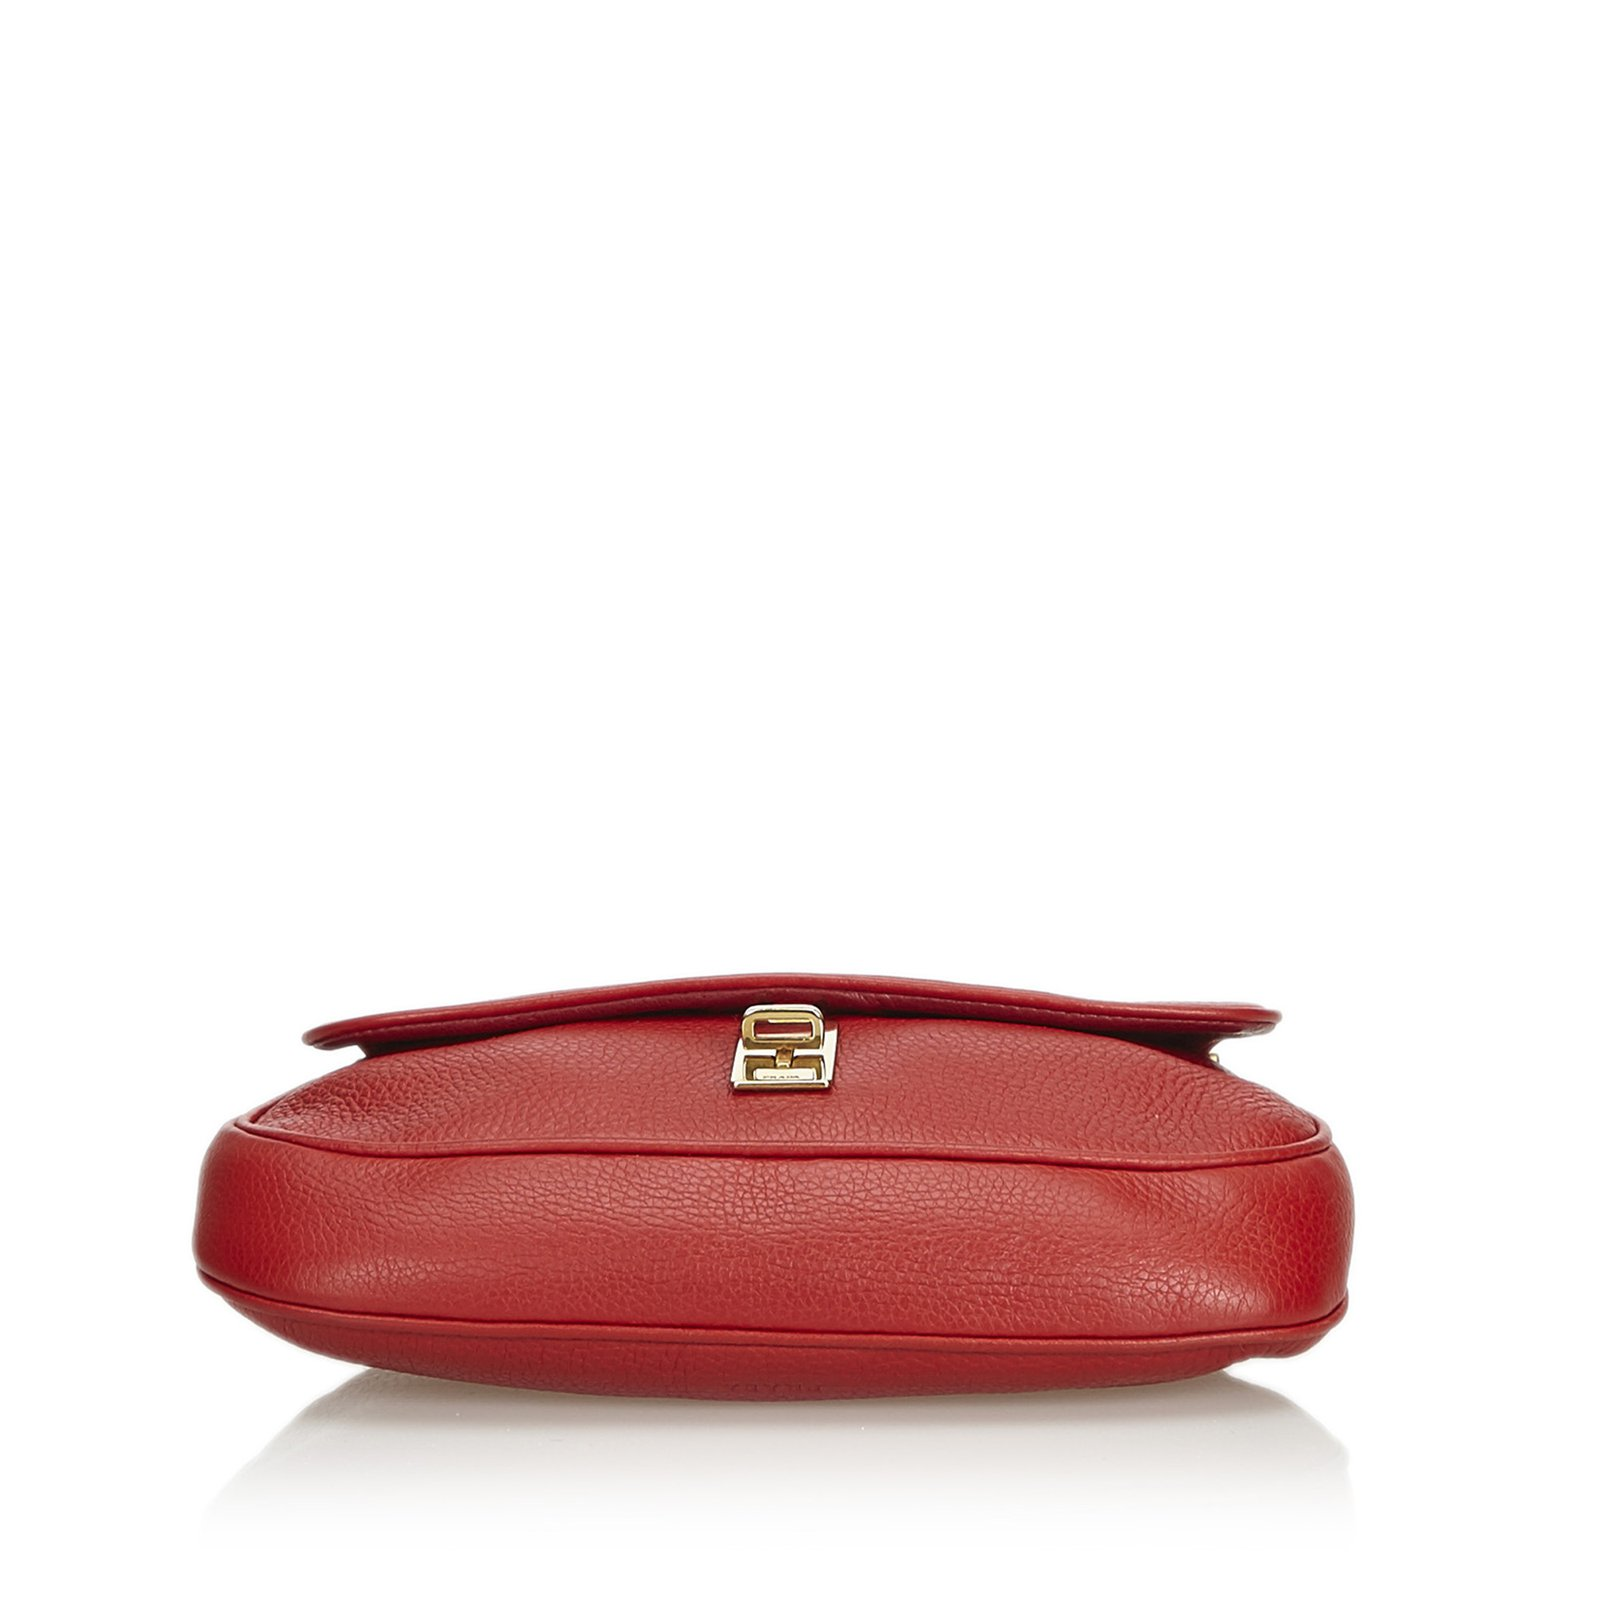 0a3f4ae4fd21 Facebook · Pin This. Prada Leather Chain Baguette ...